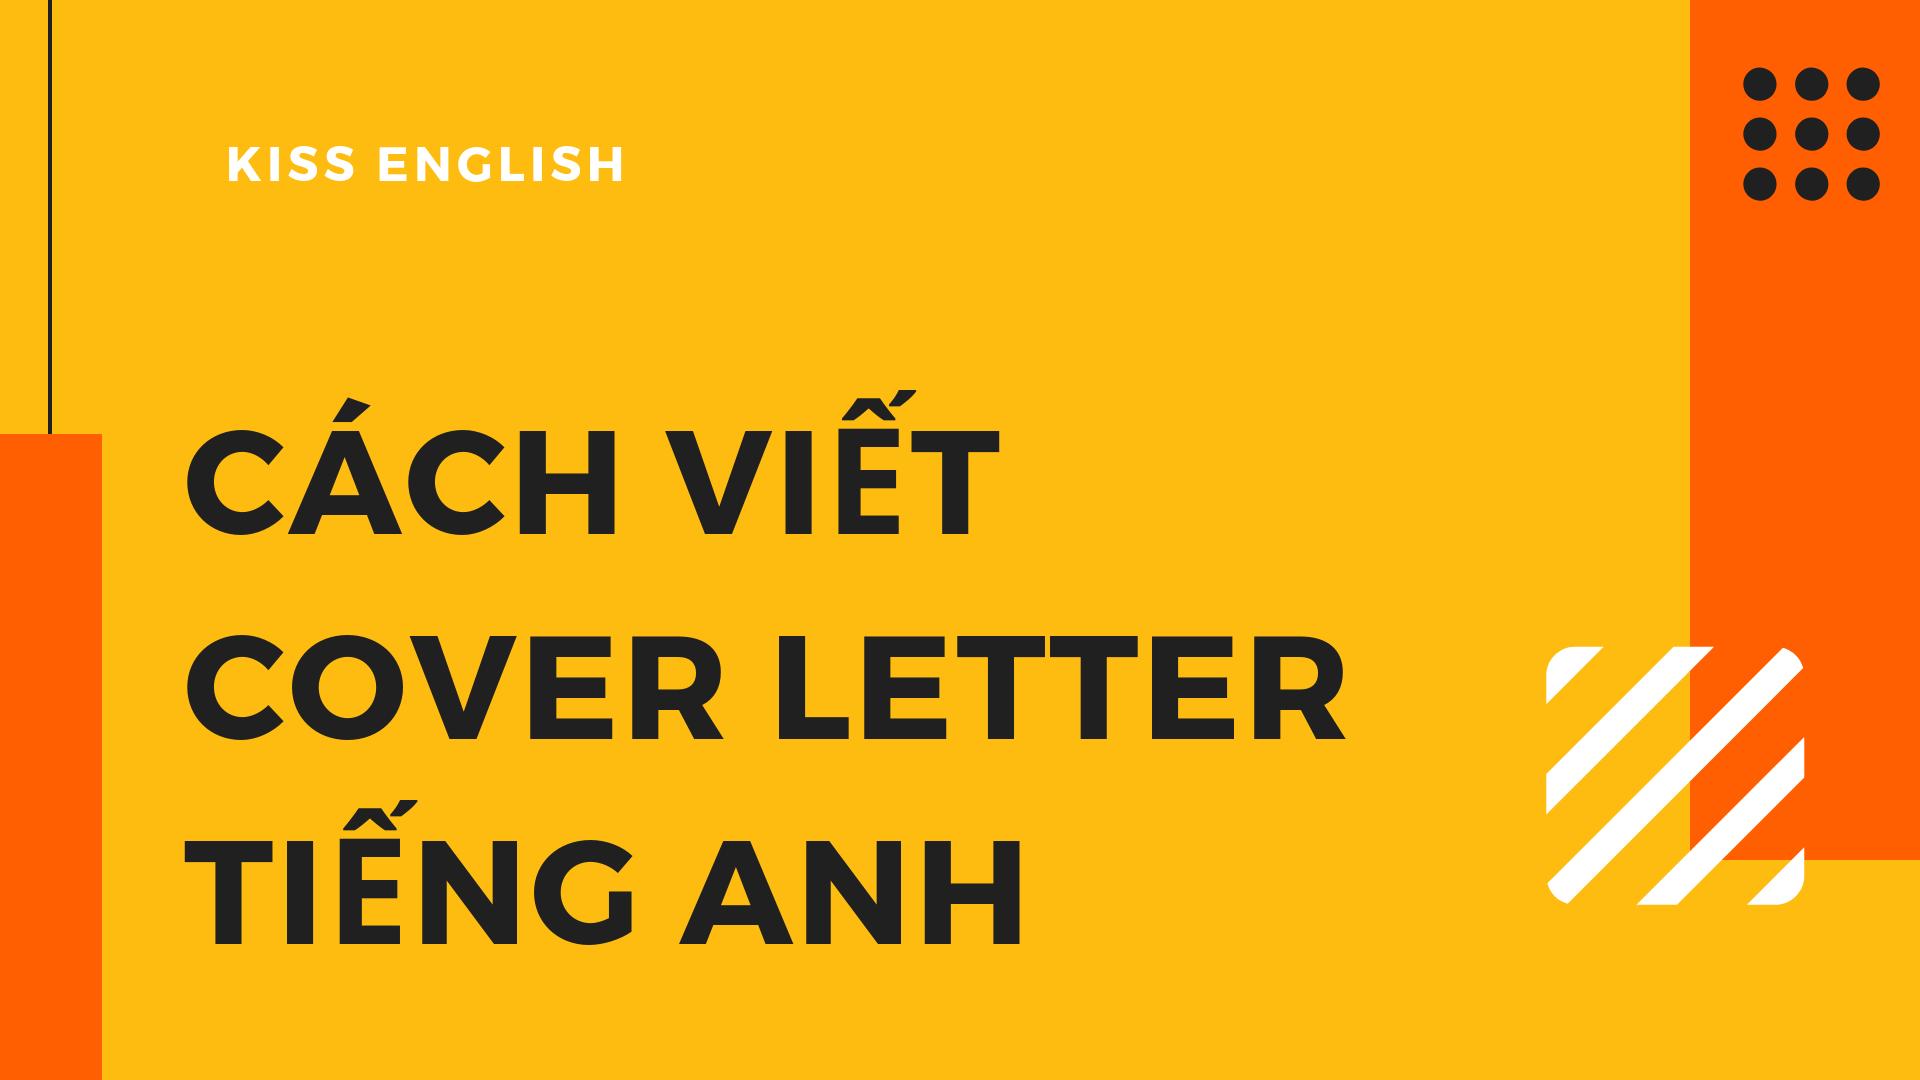 Cách viết cover letter tiếng Anh